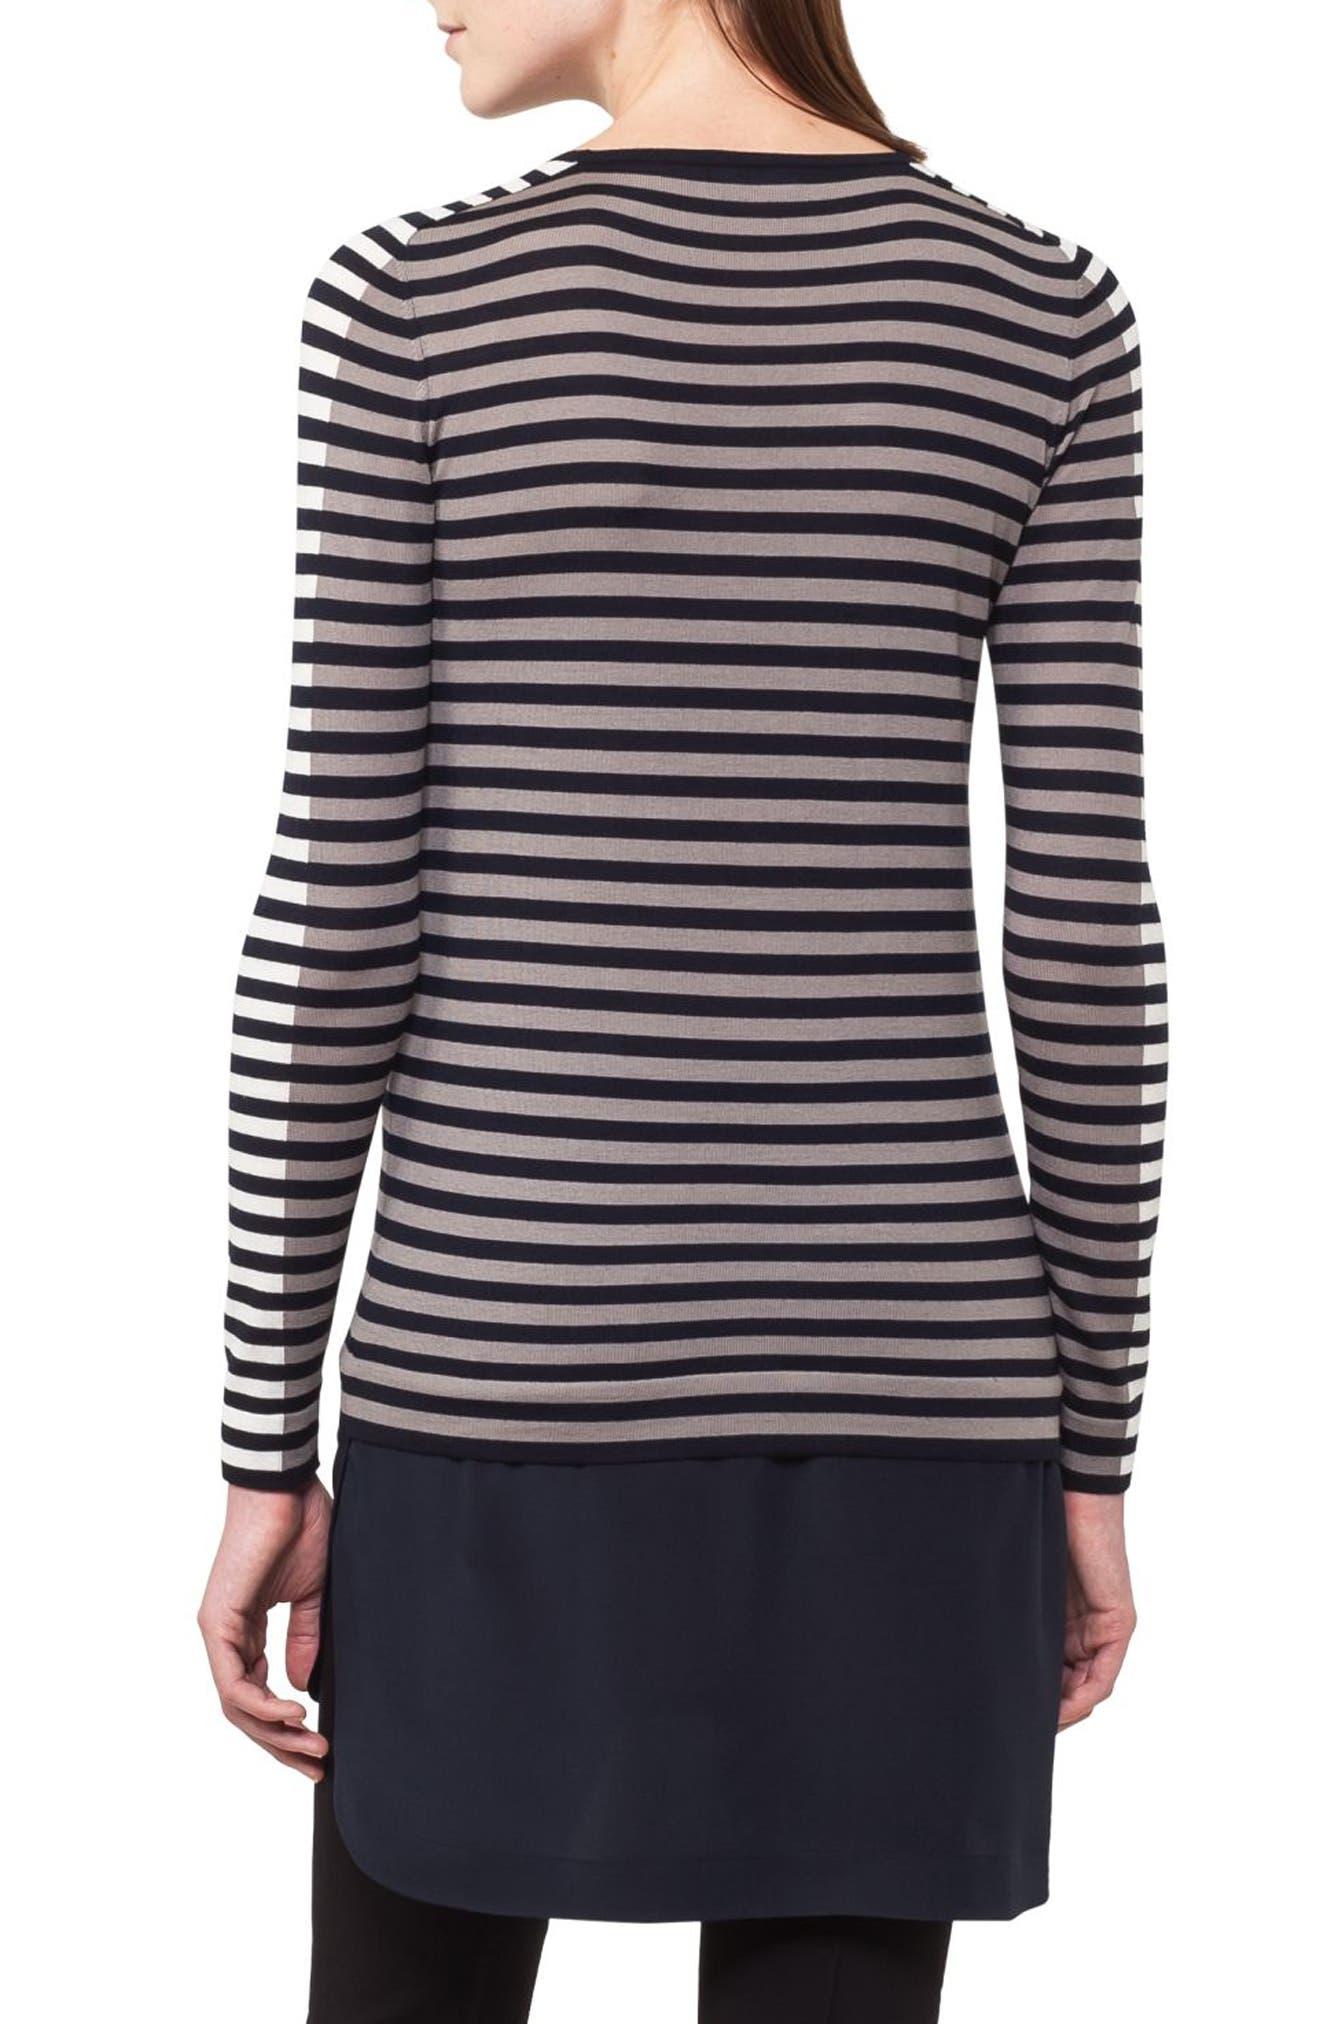 AKRIS PUNTO,                             Multicolor Stripe Wool Pullover,                             Alternate thumbnail 2, color,                             400